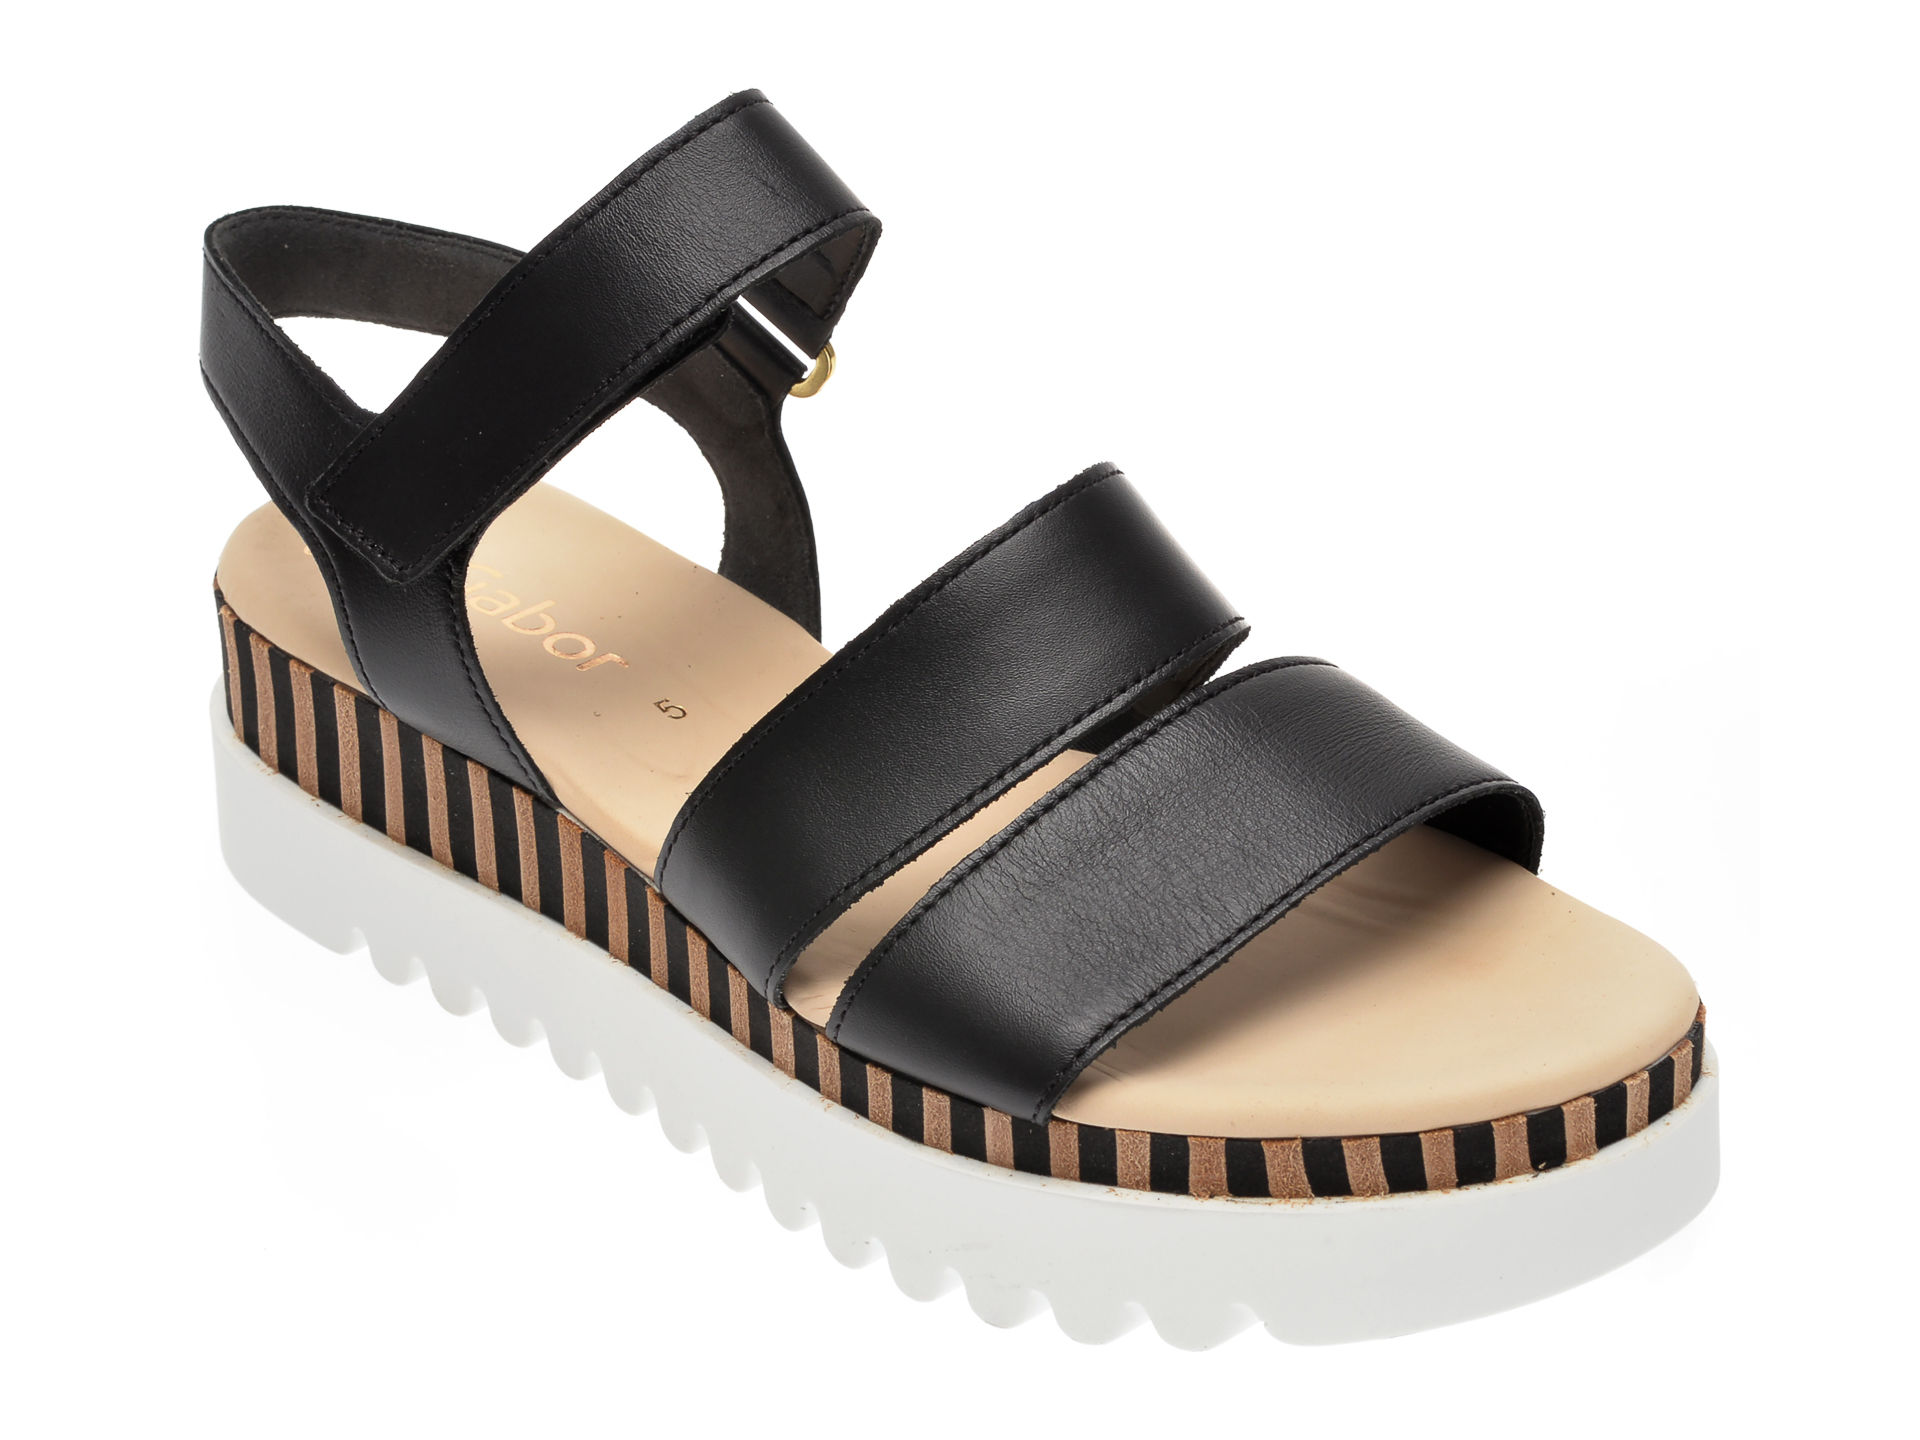 Sandale GABOR negre, 44660, din piele naturala